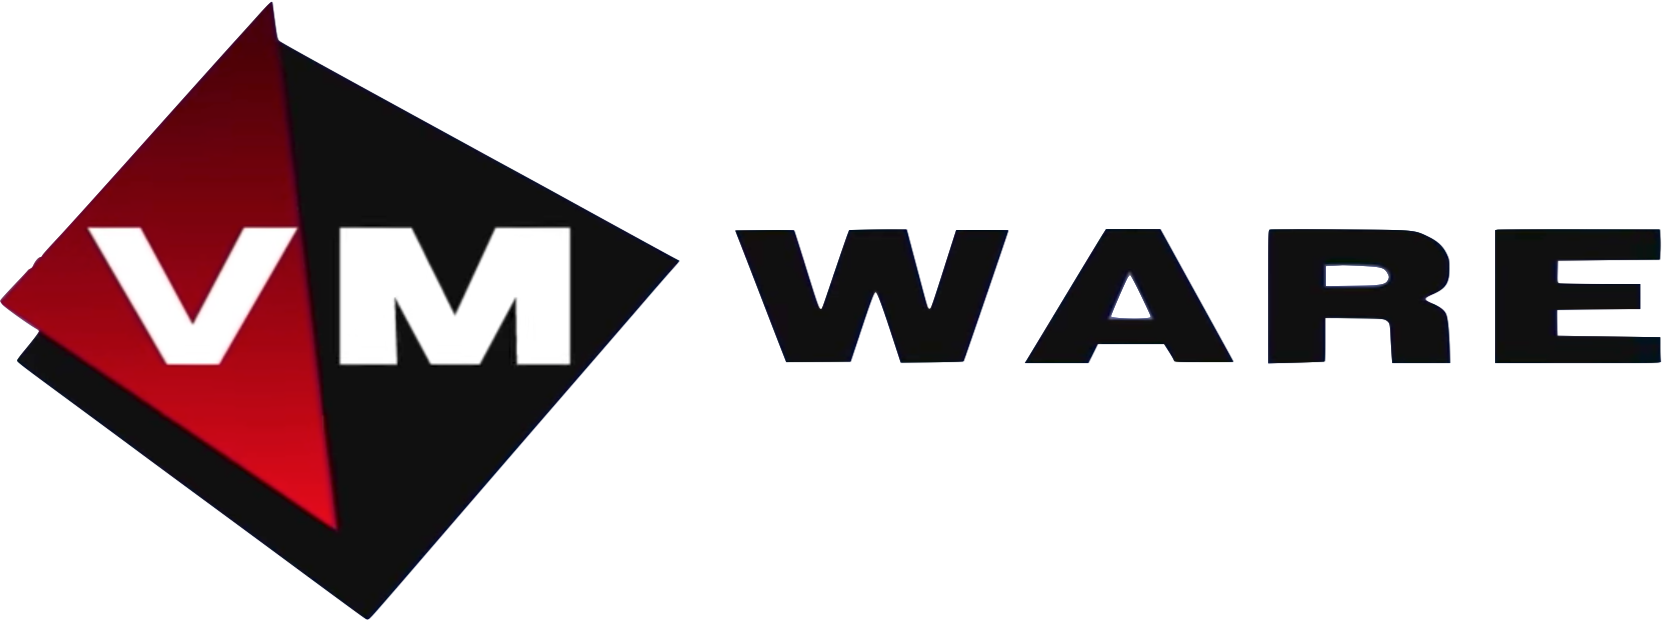 vmware logo choice image